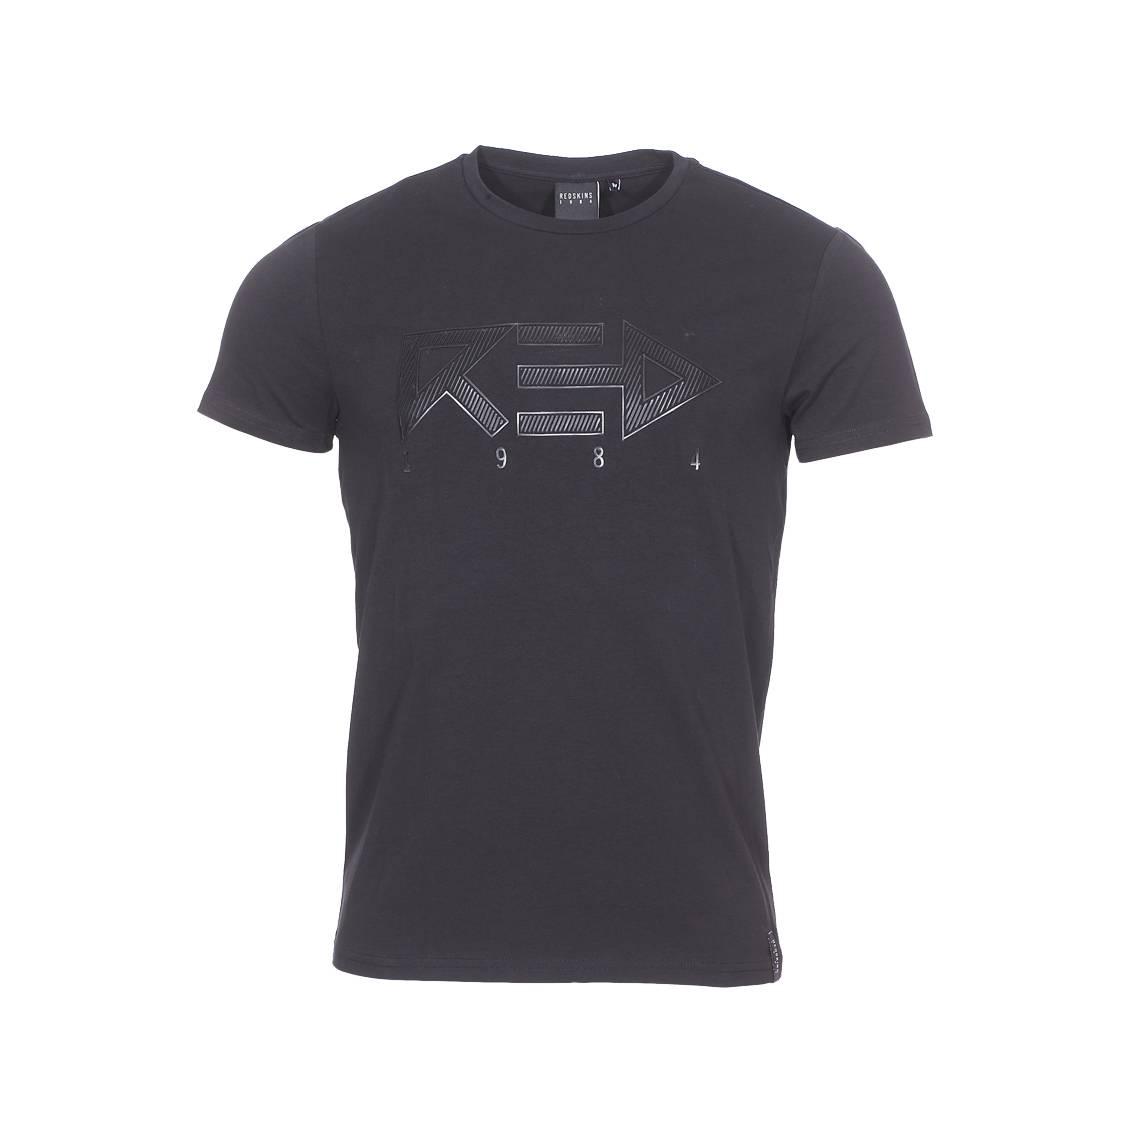 Tee-shirt col rond  blocker en coton stretch noir floqué